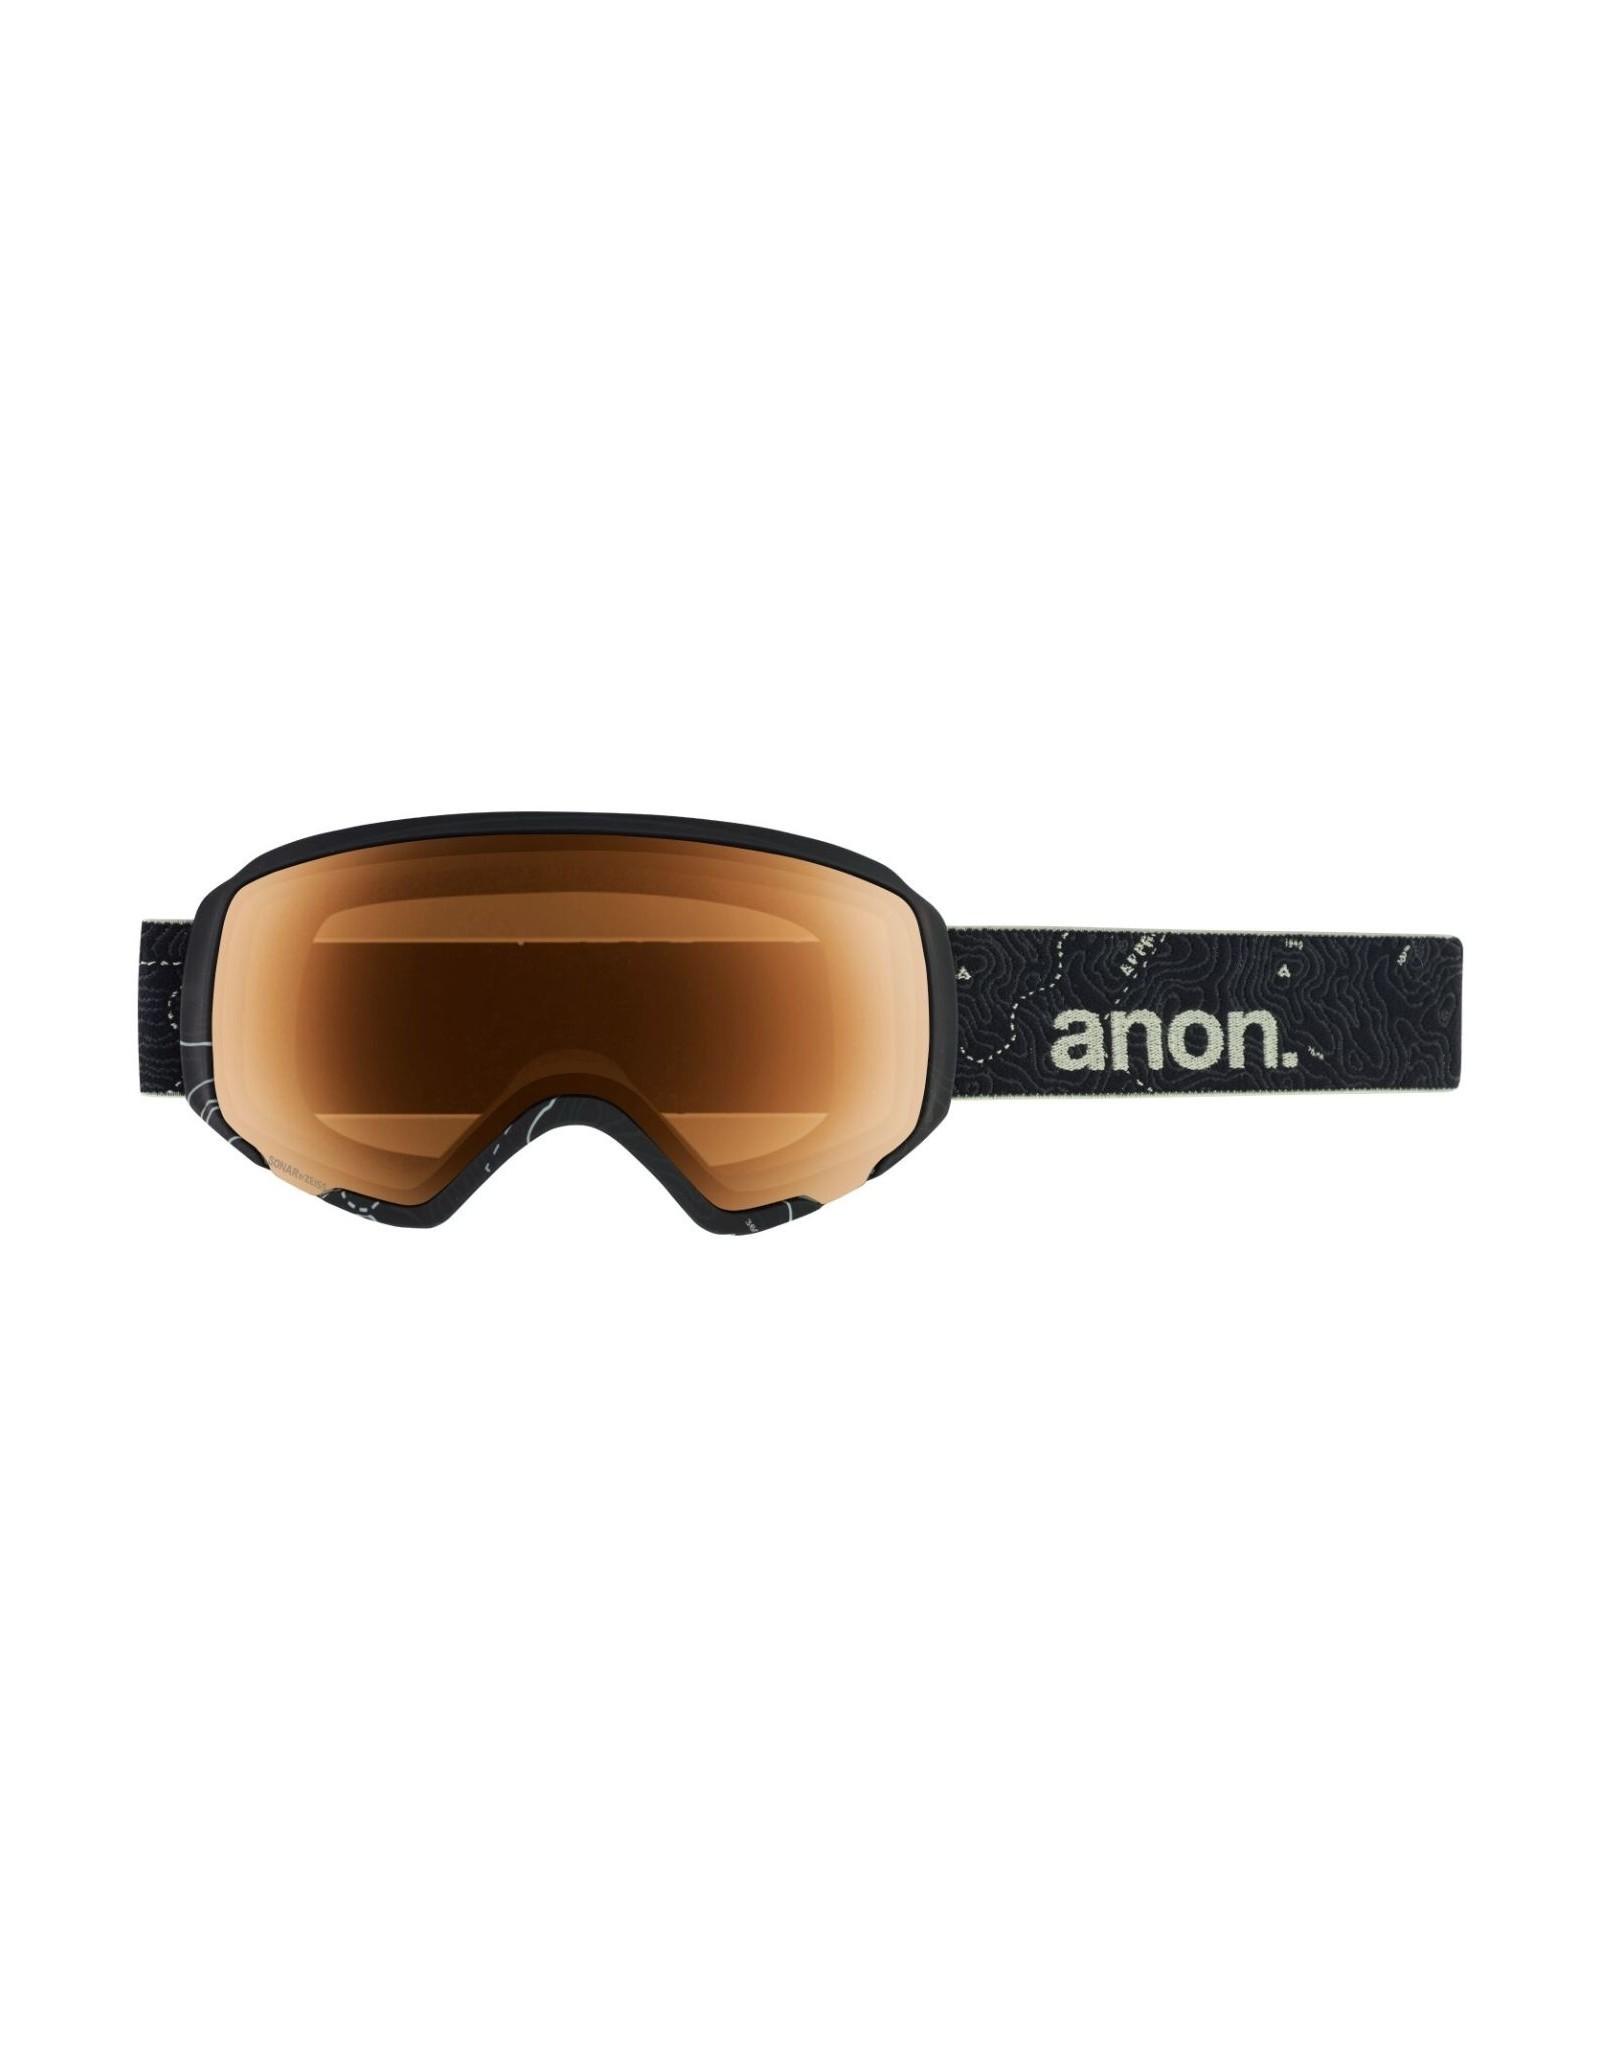 Anon Anon Women's WM1 Goggle + Spare Lens